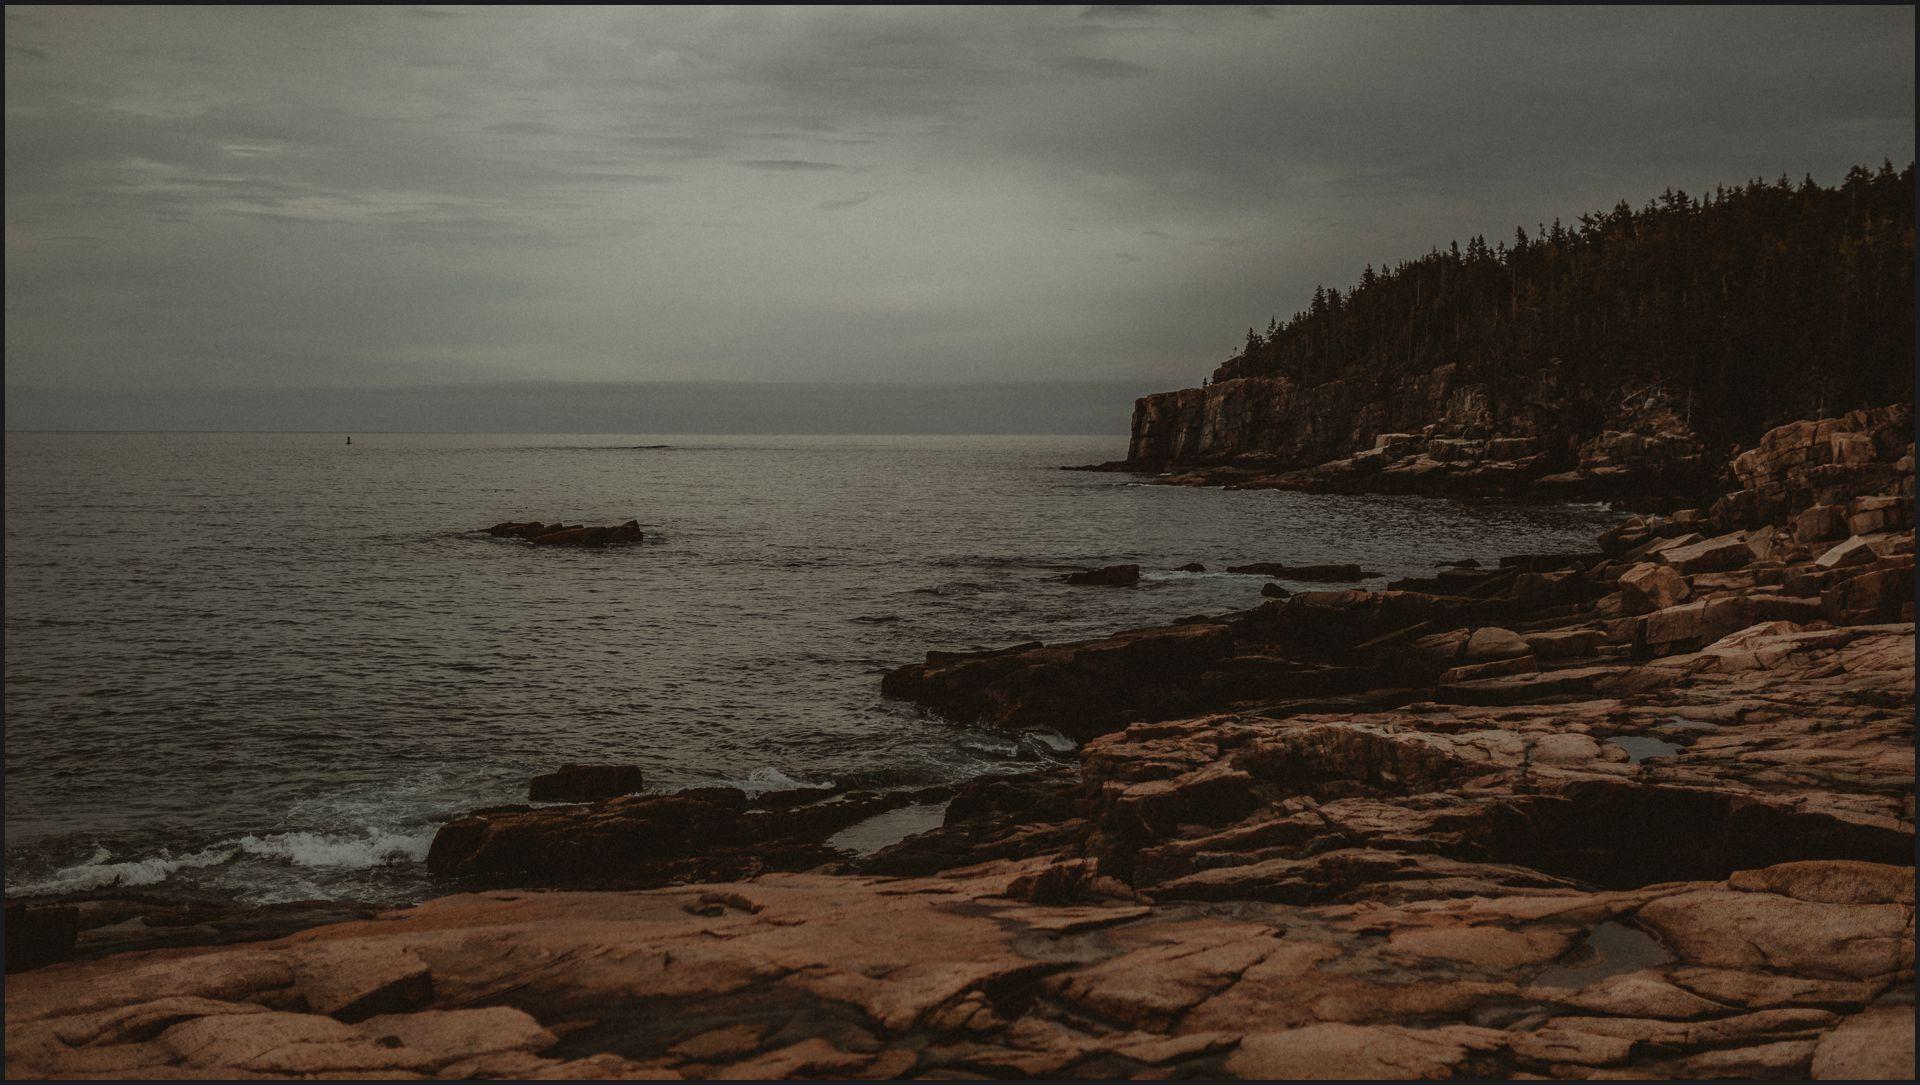 acadia national park, ceremony venue, bar harbor, maine wedding, cliff, ocean, ocean view